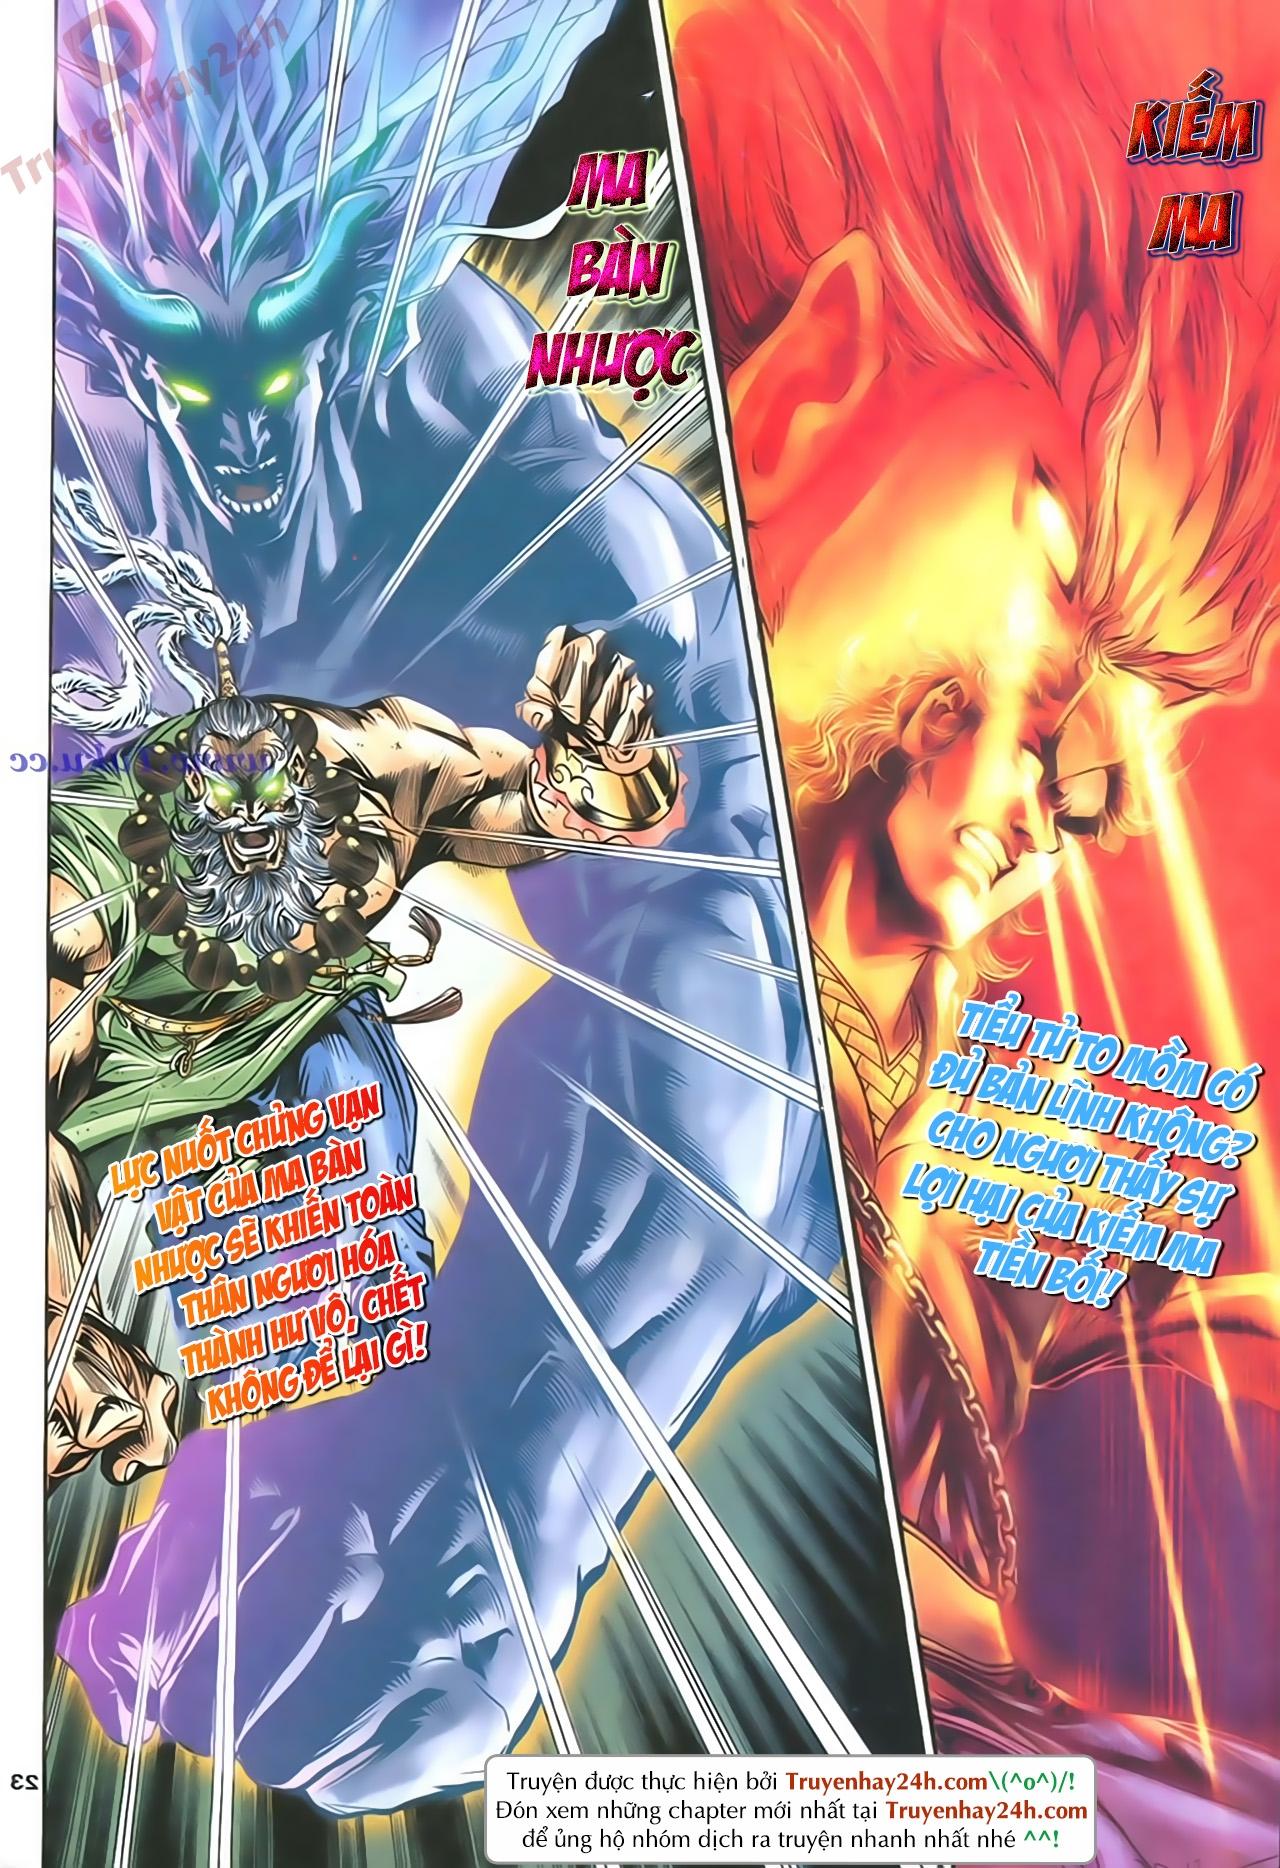 Thần Điêu Hiệp Lữ chap 86 – End Trang 23 - Mangak.info